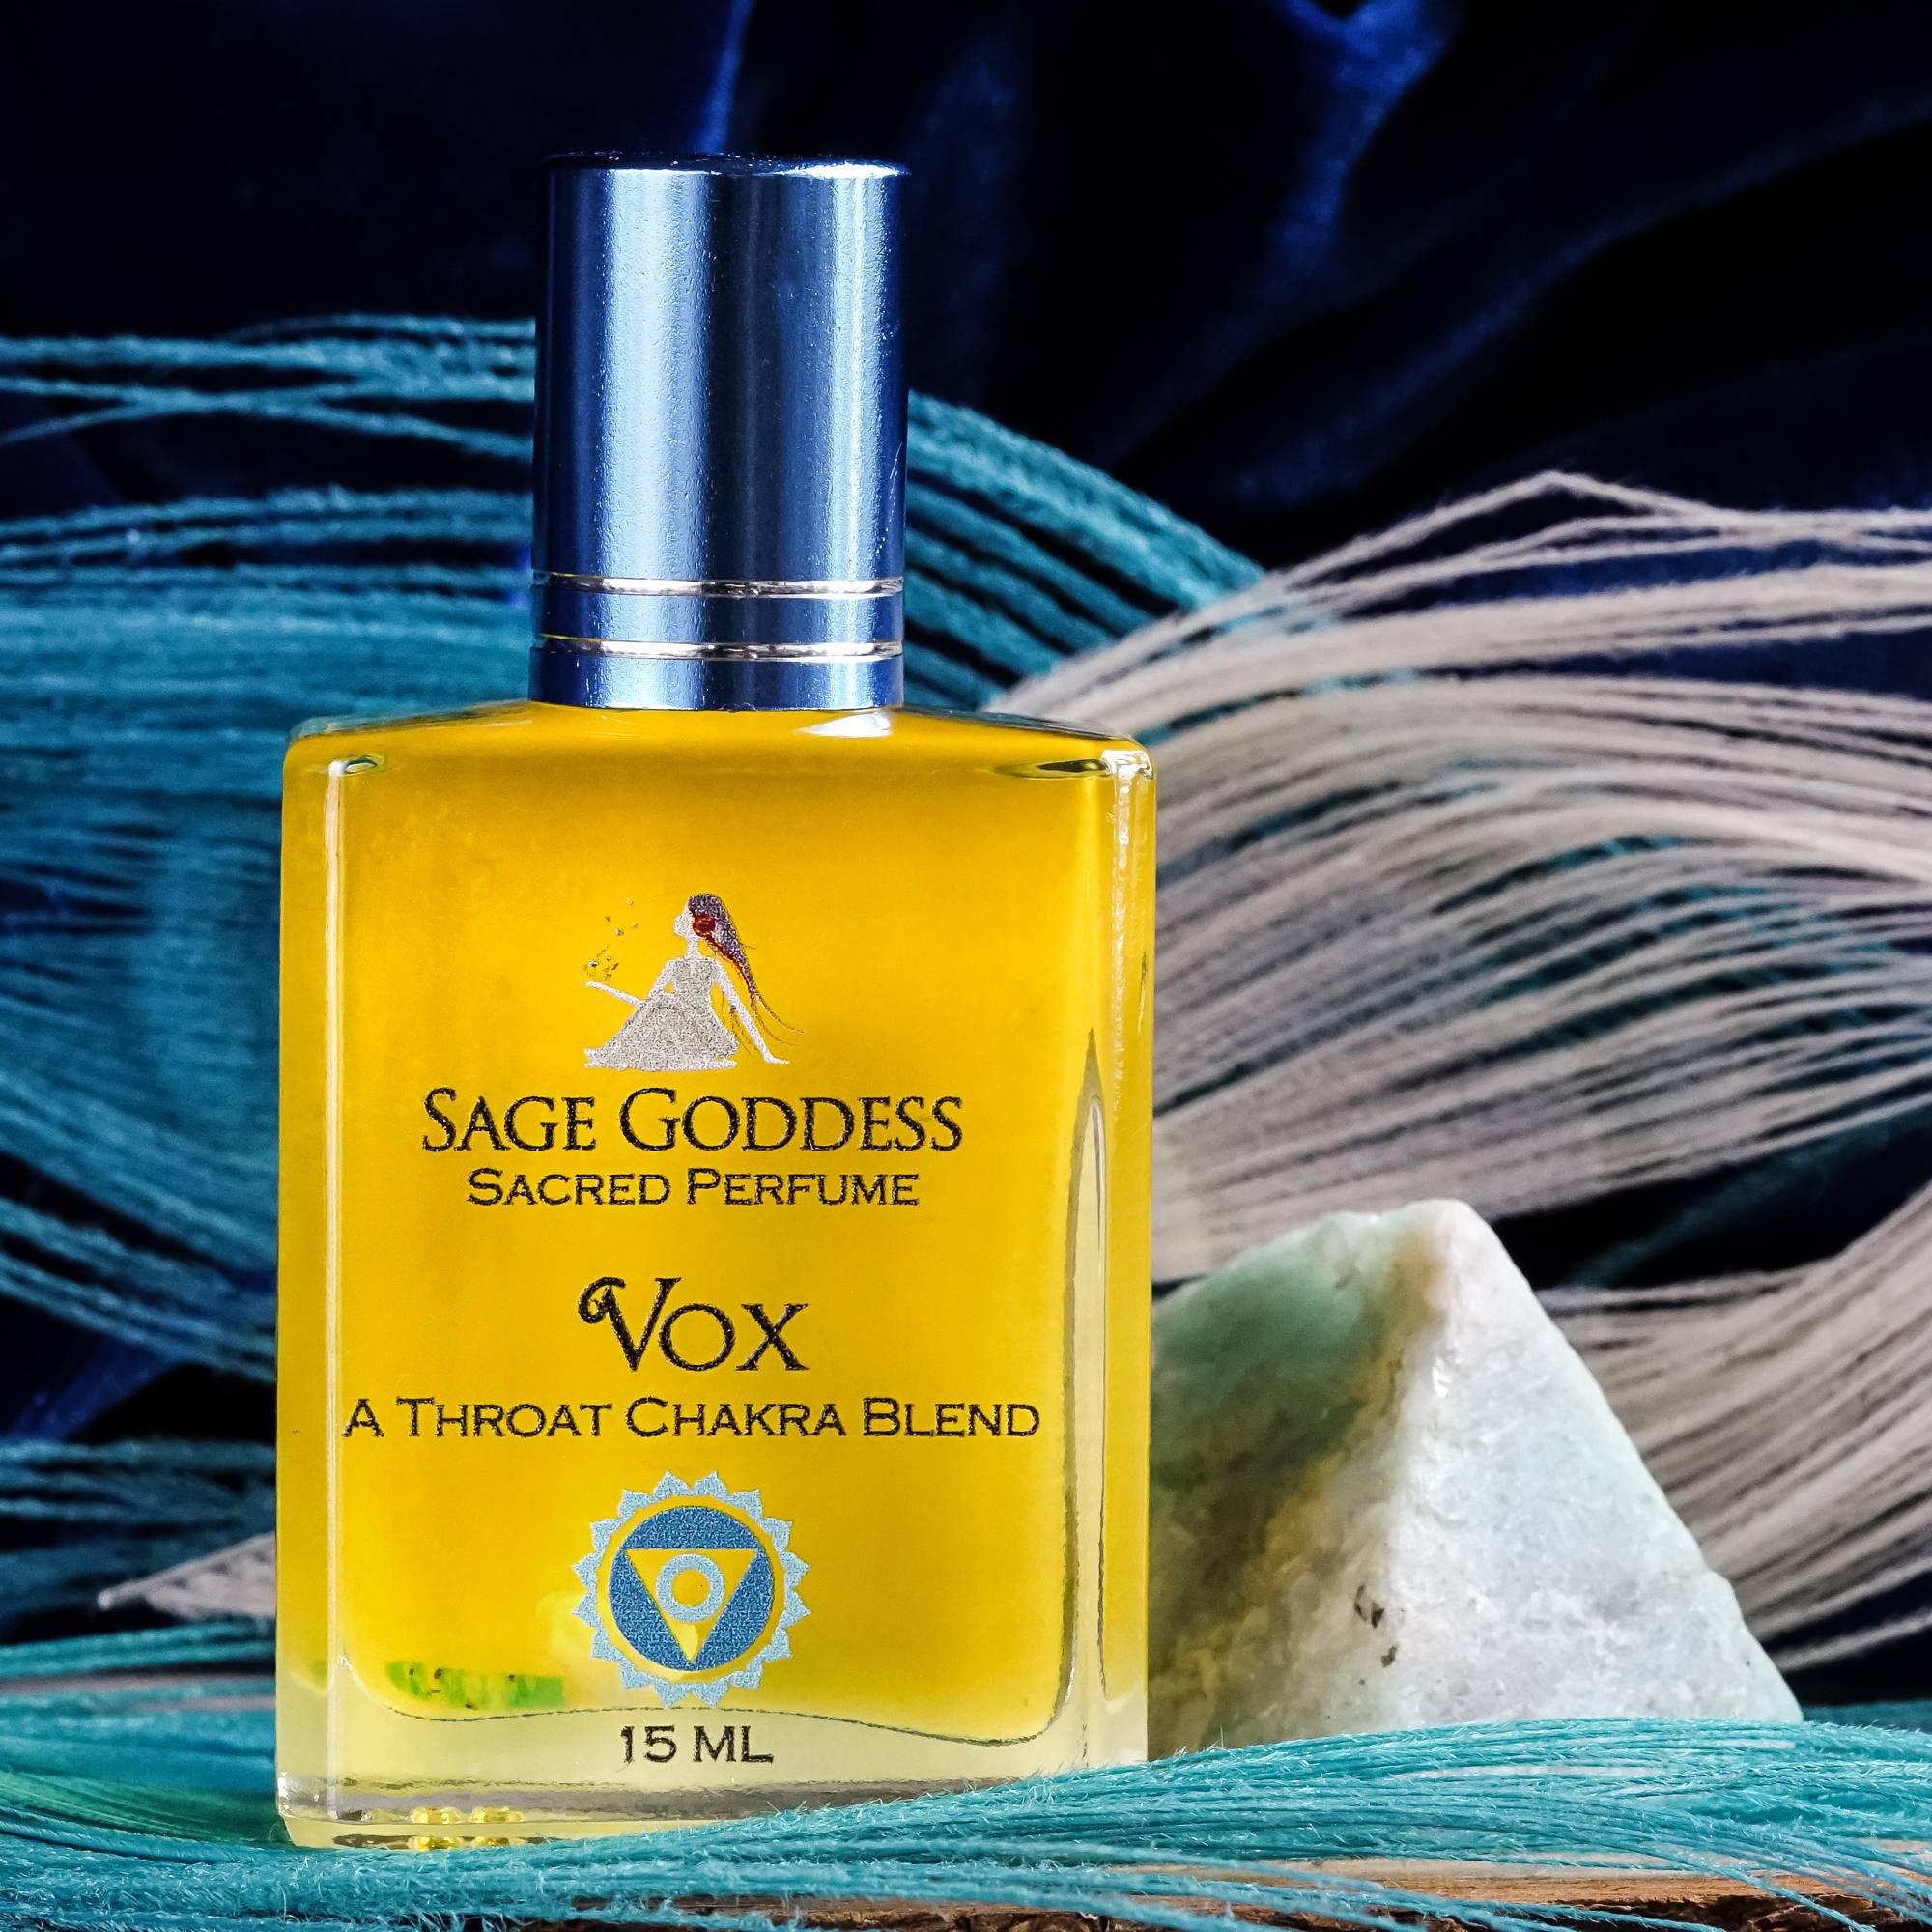 vox parfume with natural amazonite